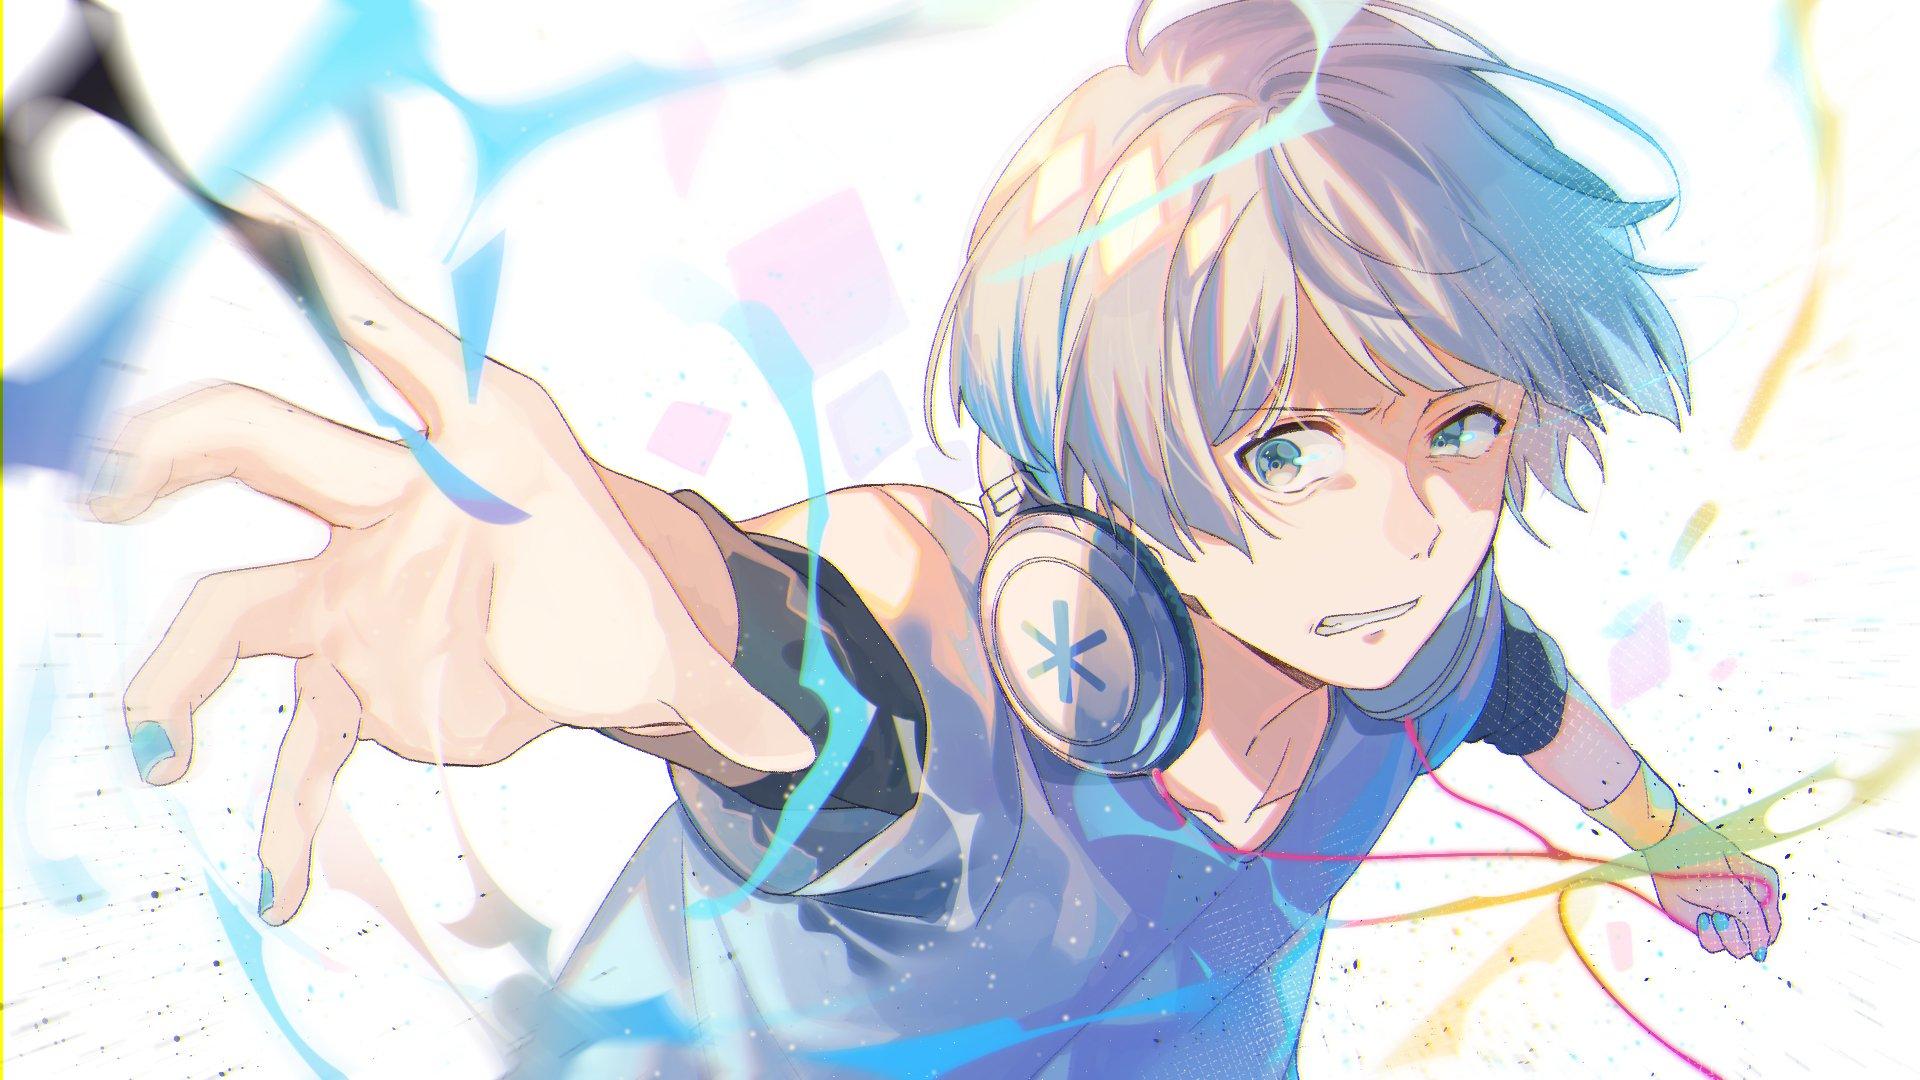 Boy Headphones Hd Wallpaper Background Image 1920x1080 Id 941401 Wallpaper Abyss